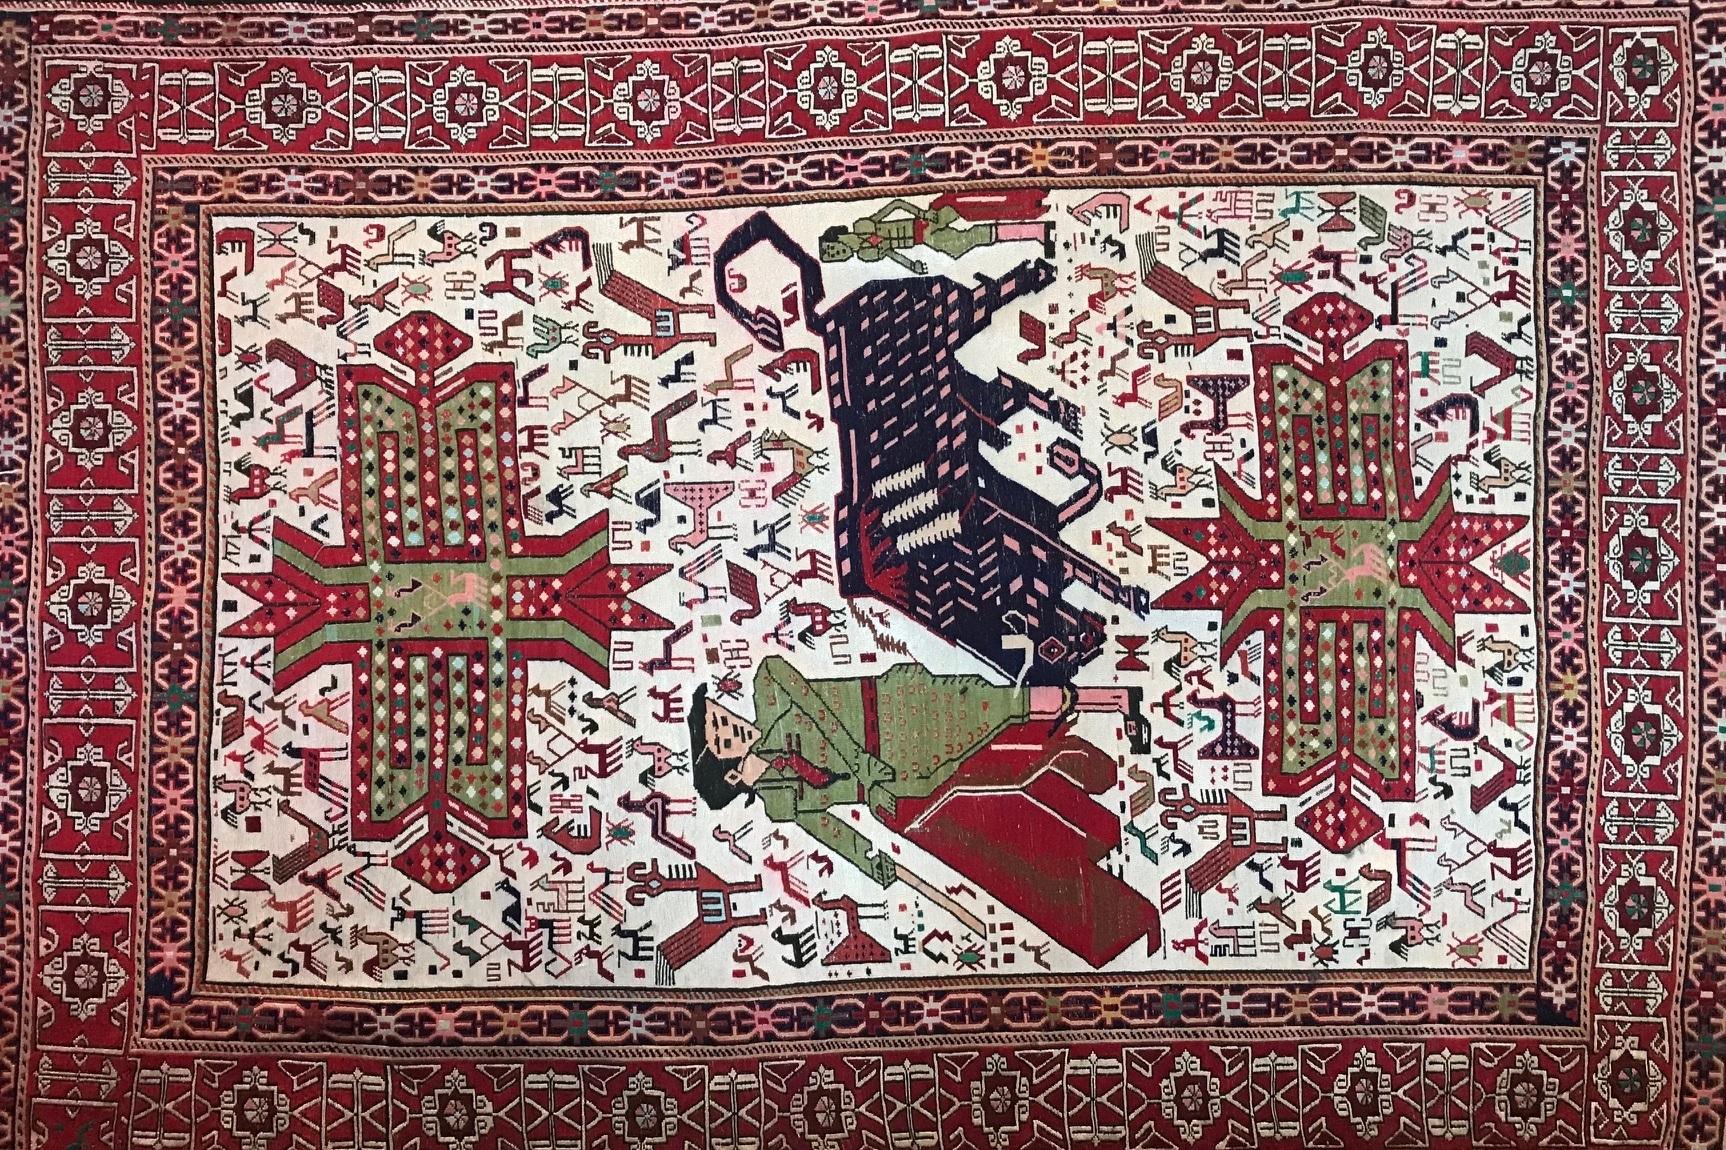 Martin Sheen Spanish Rug - Martin Sheen's Spanish rug donated by the Sheen family. 6 × 4'Priceless valueStarting bid $80